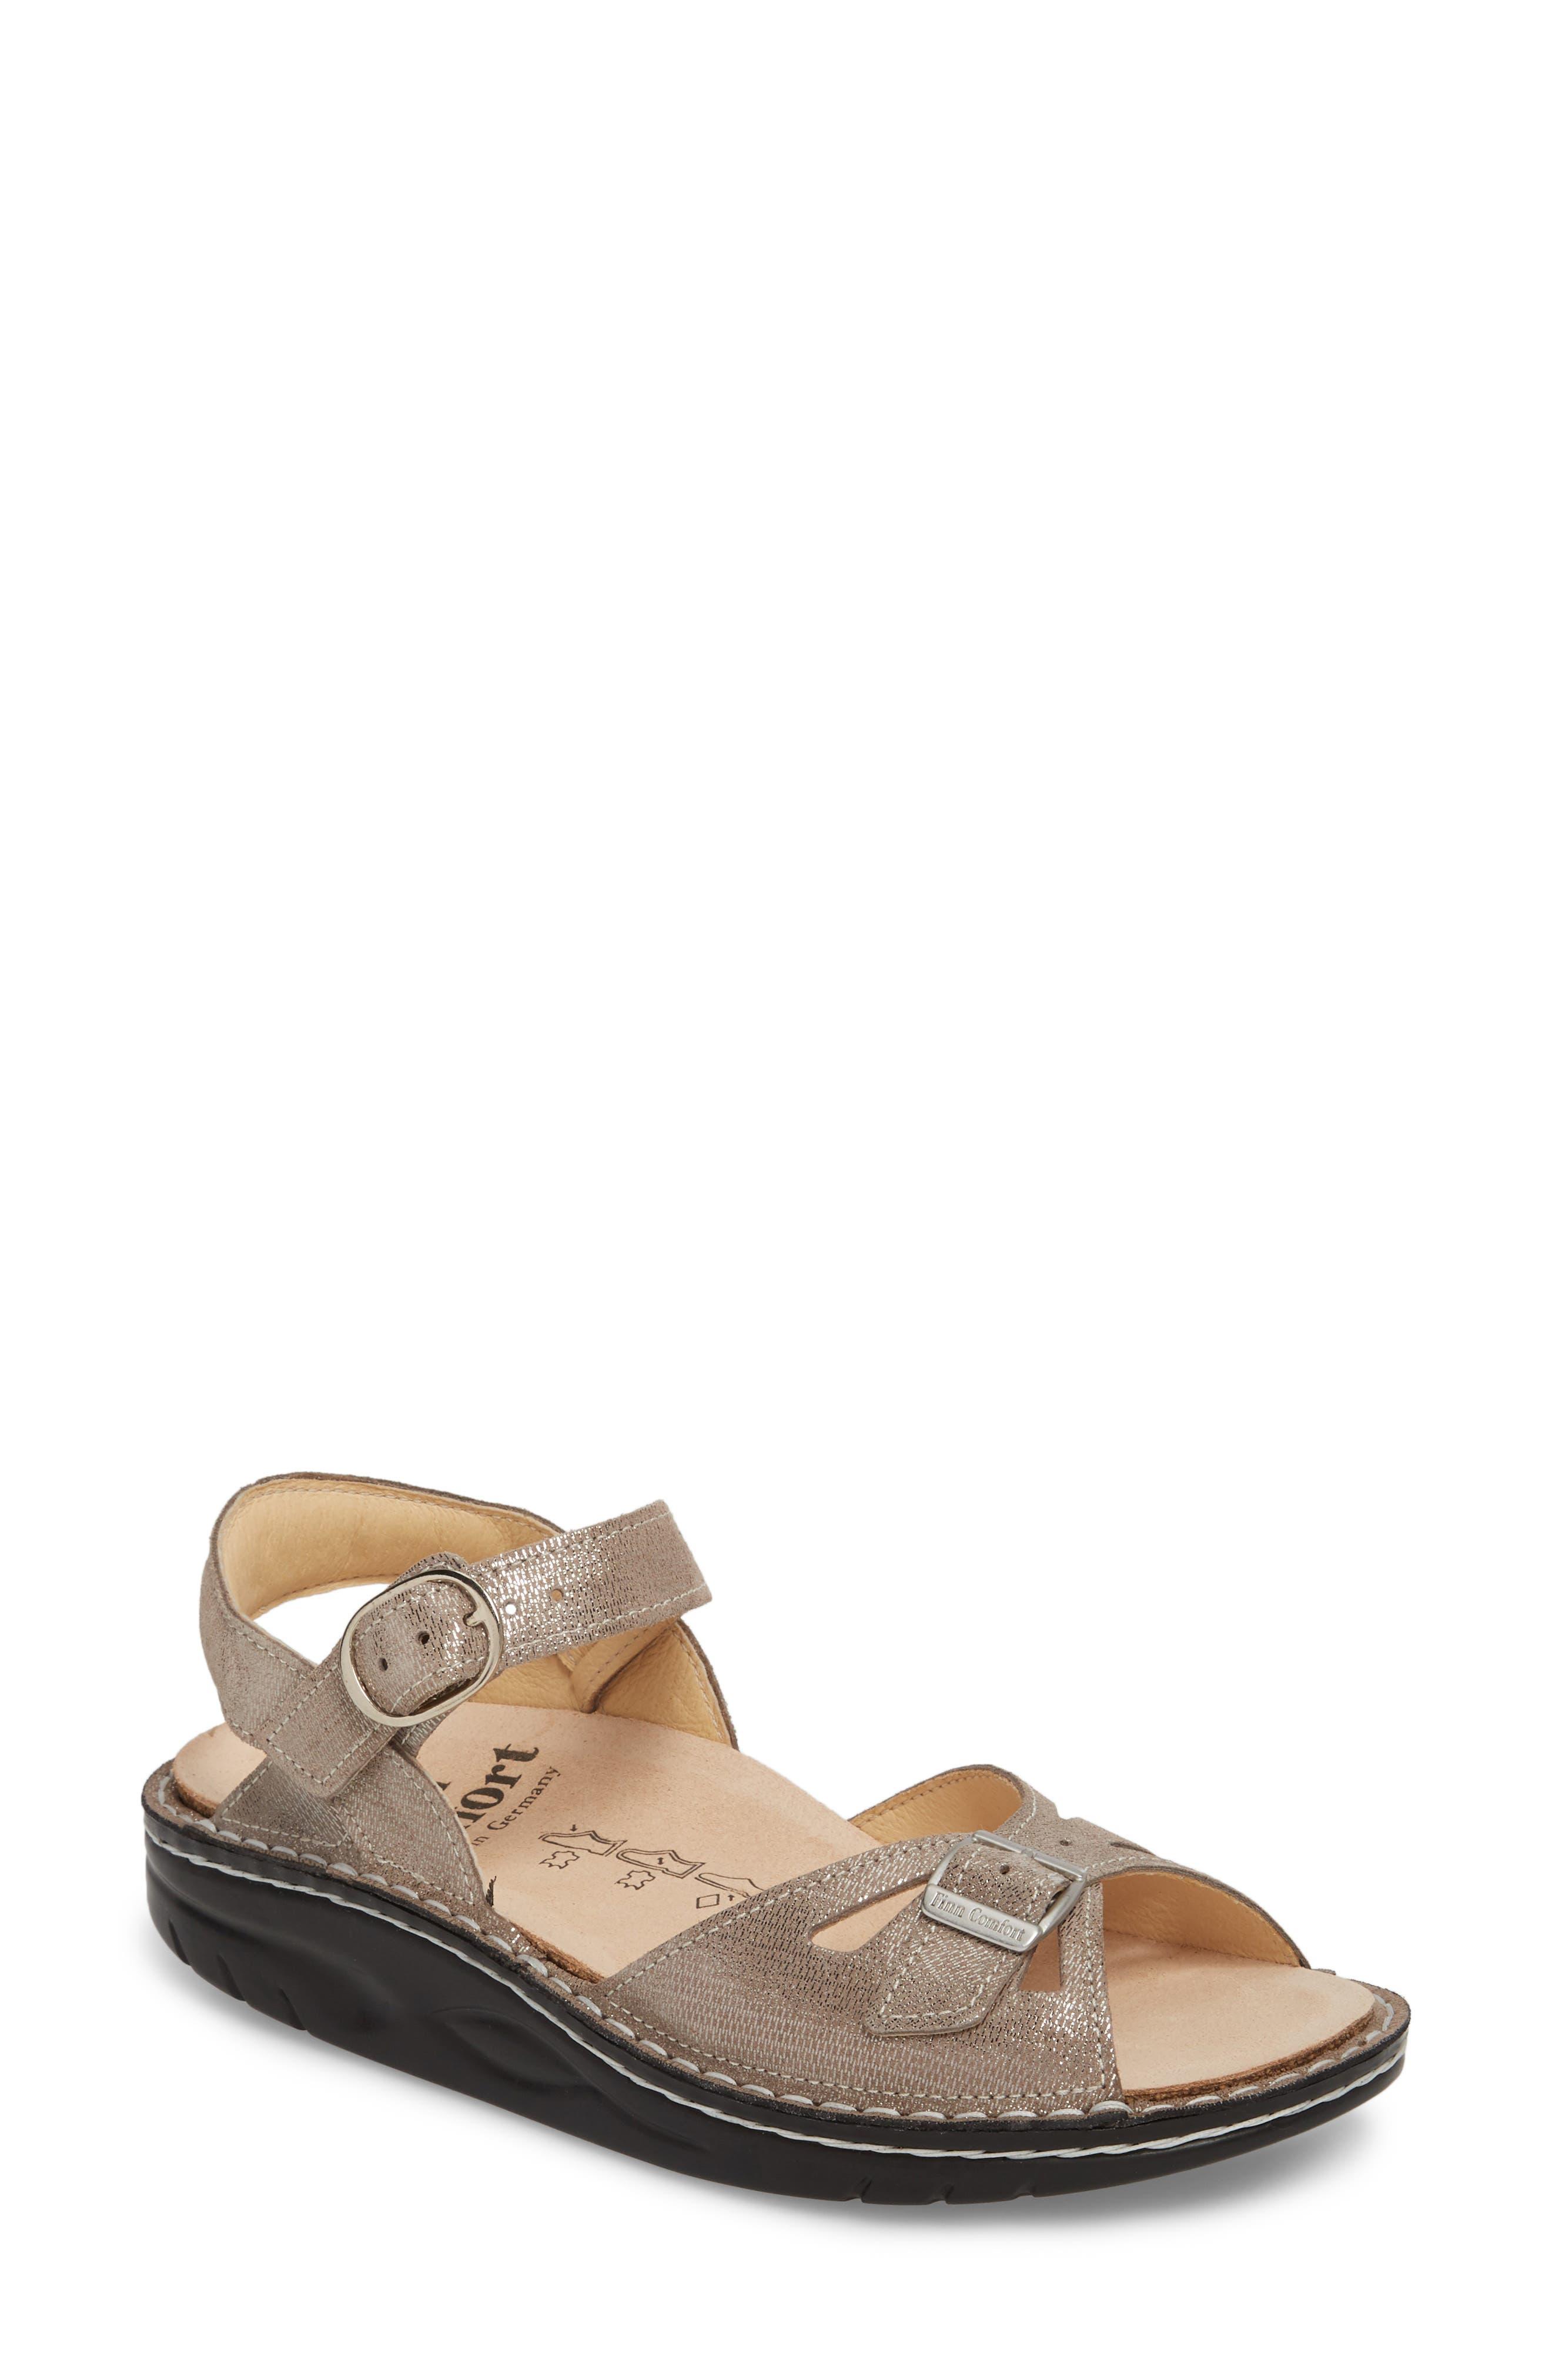 Motomachi Sandal,                         Main,                         color, Fango Leather